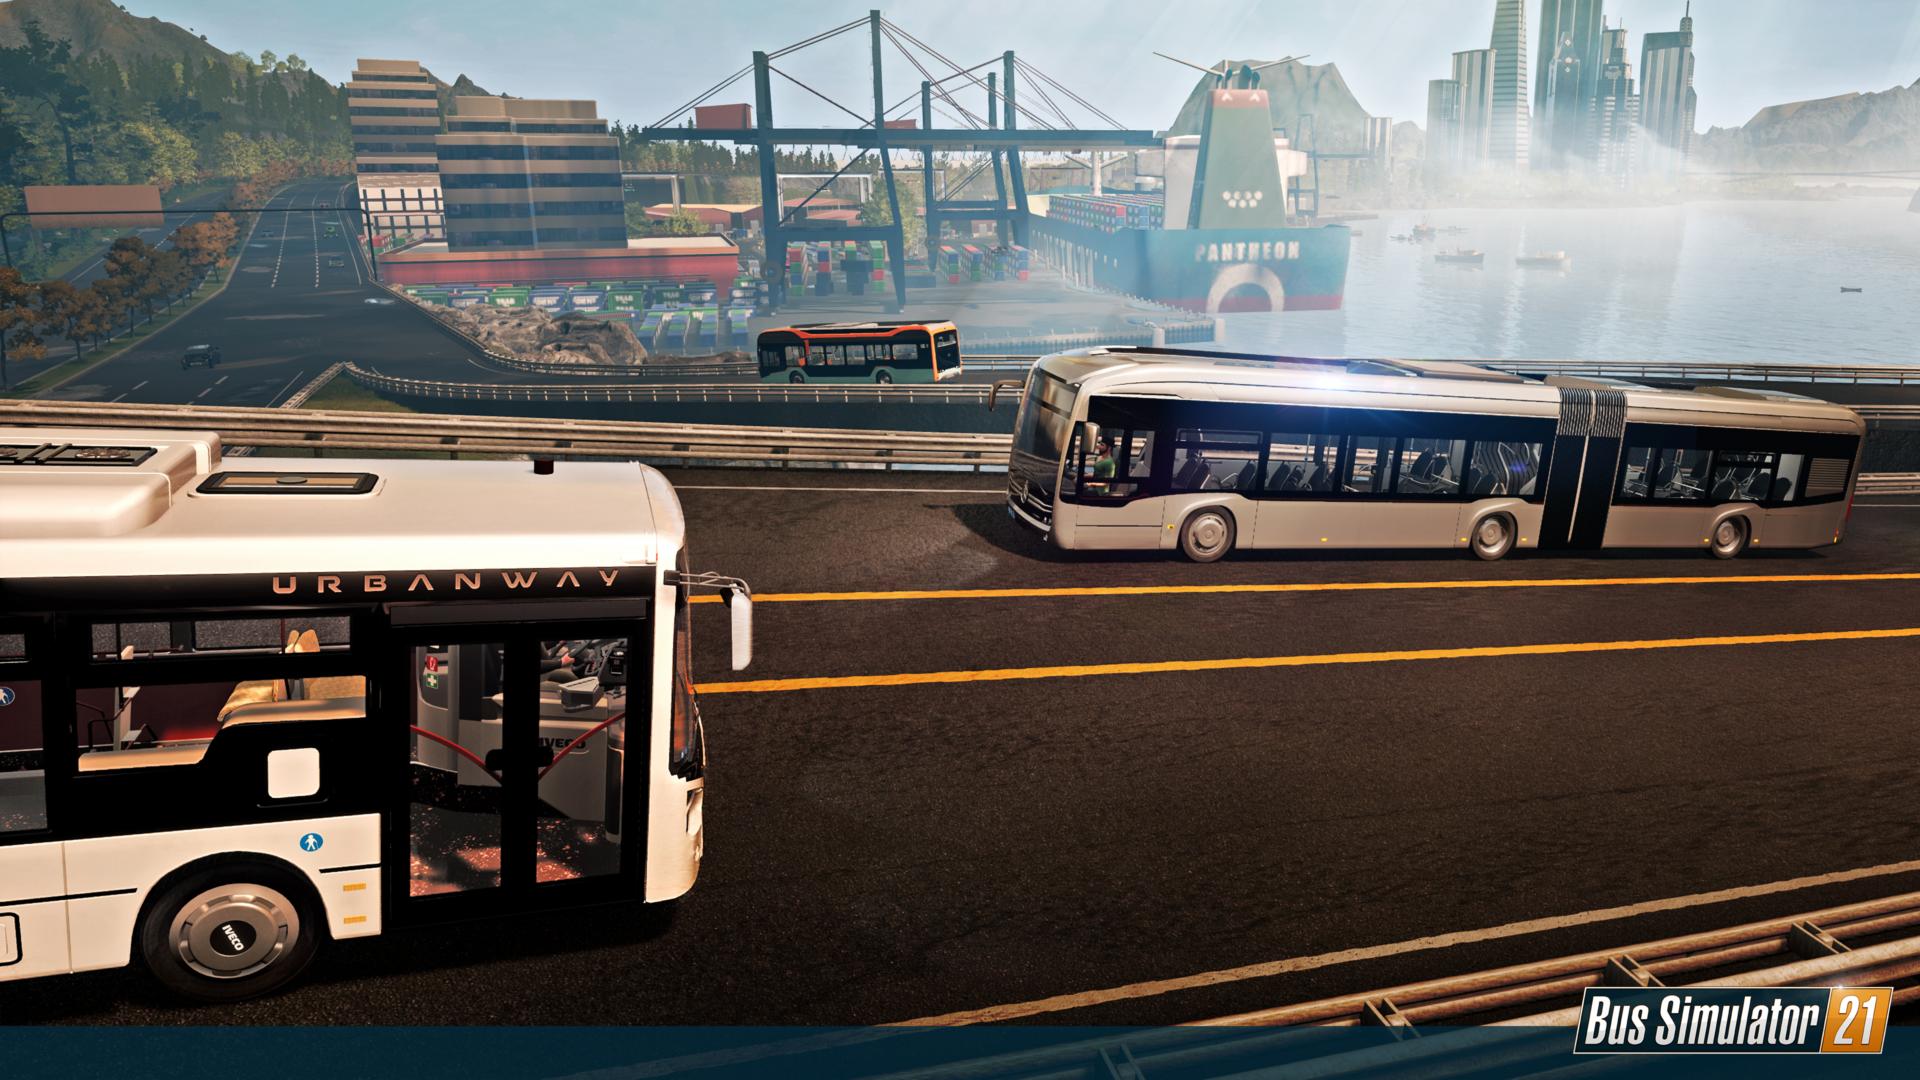 Bus Simulator 21 Reveals Full Vehicle List in New Brands Showcase Trailer